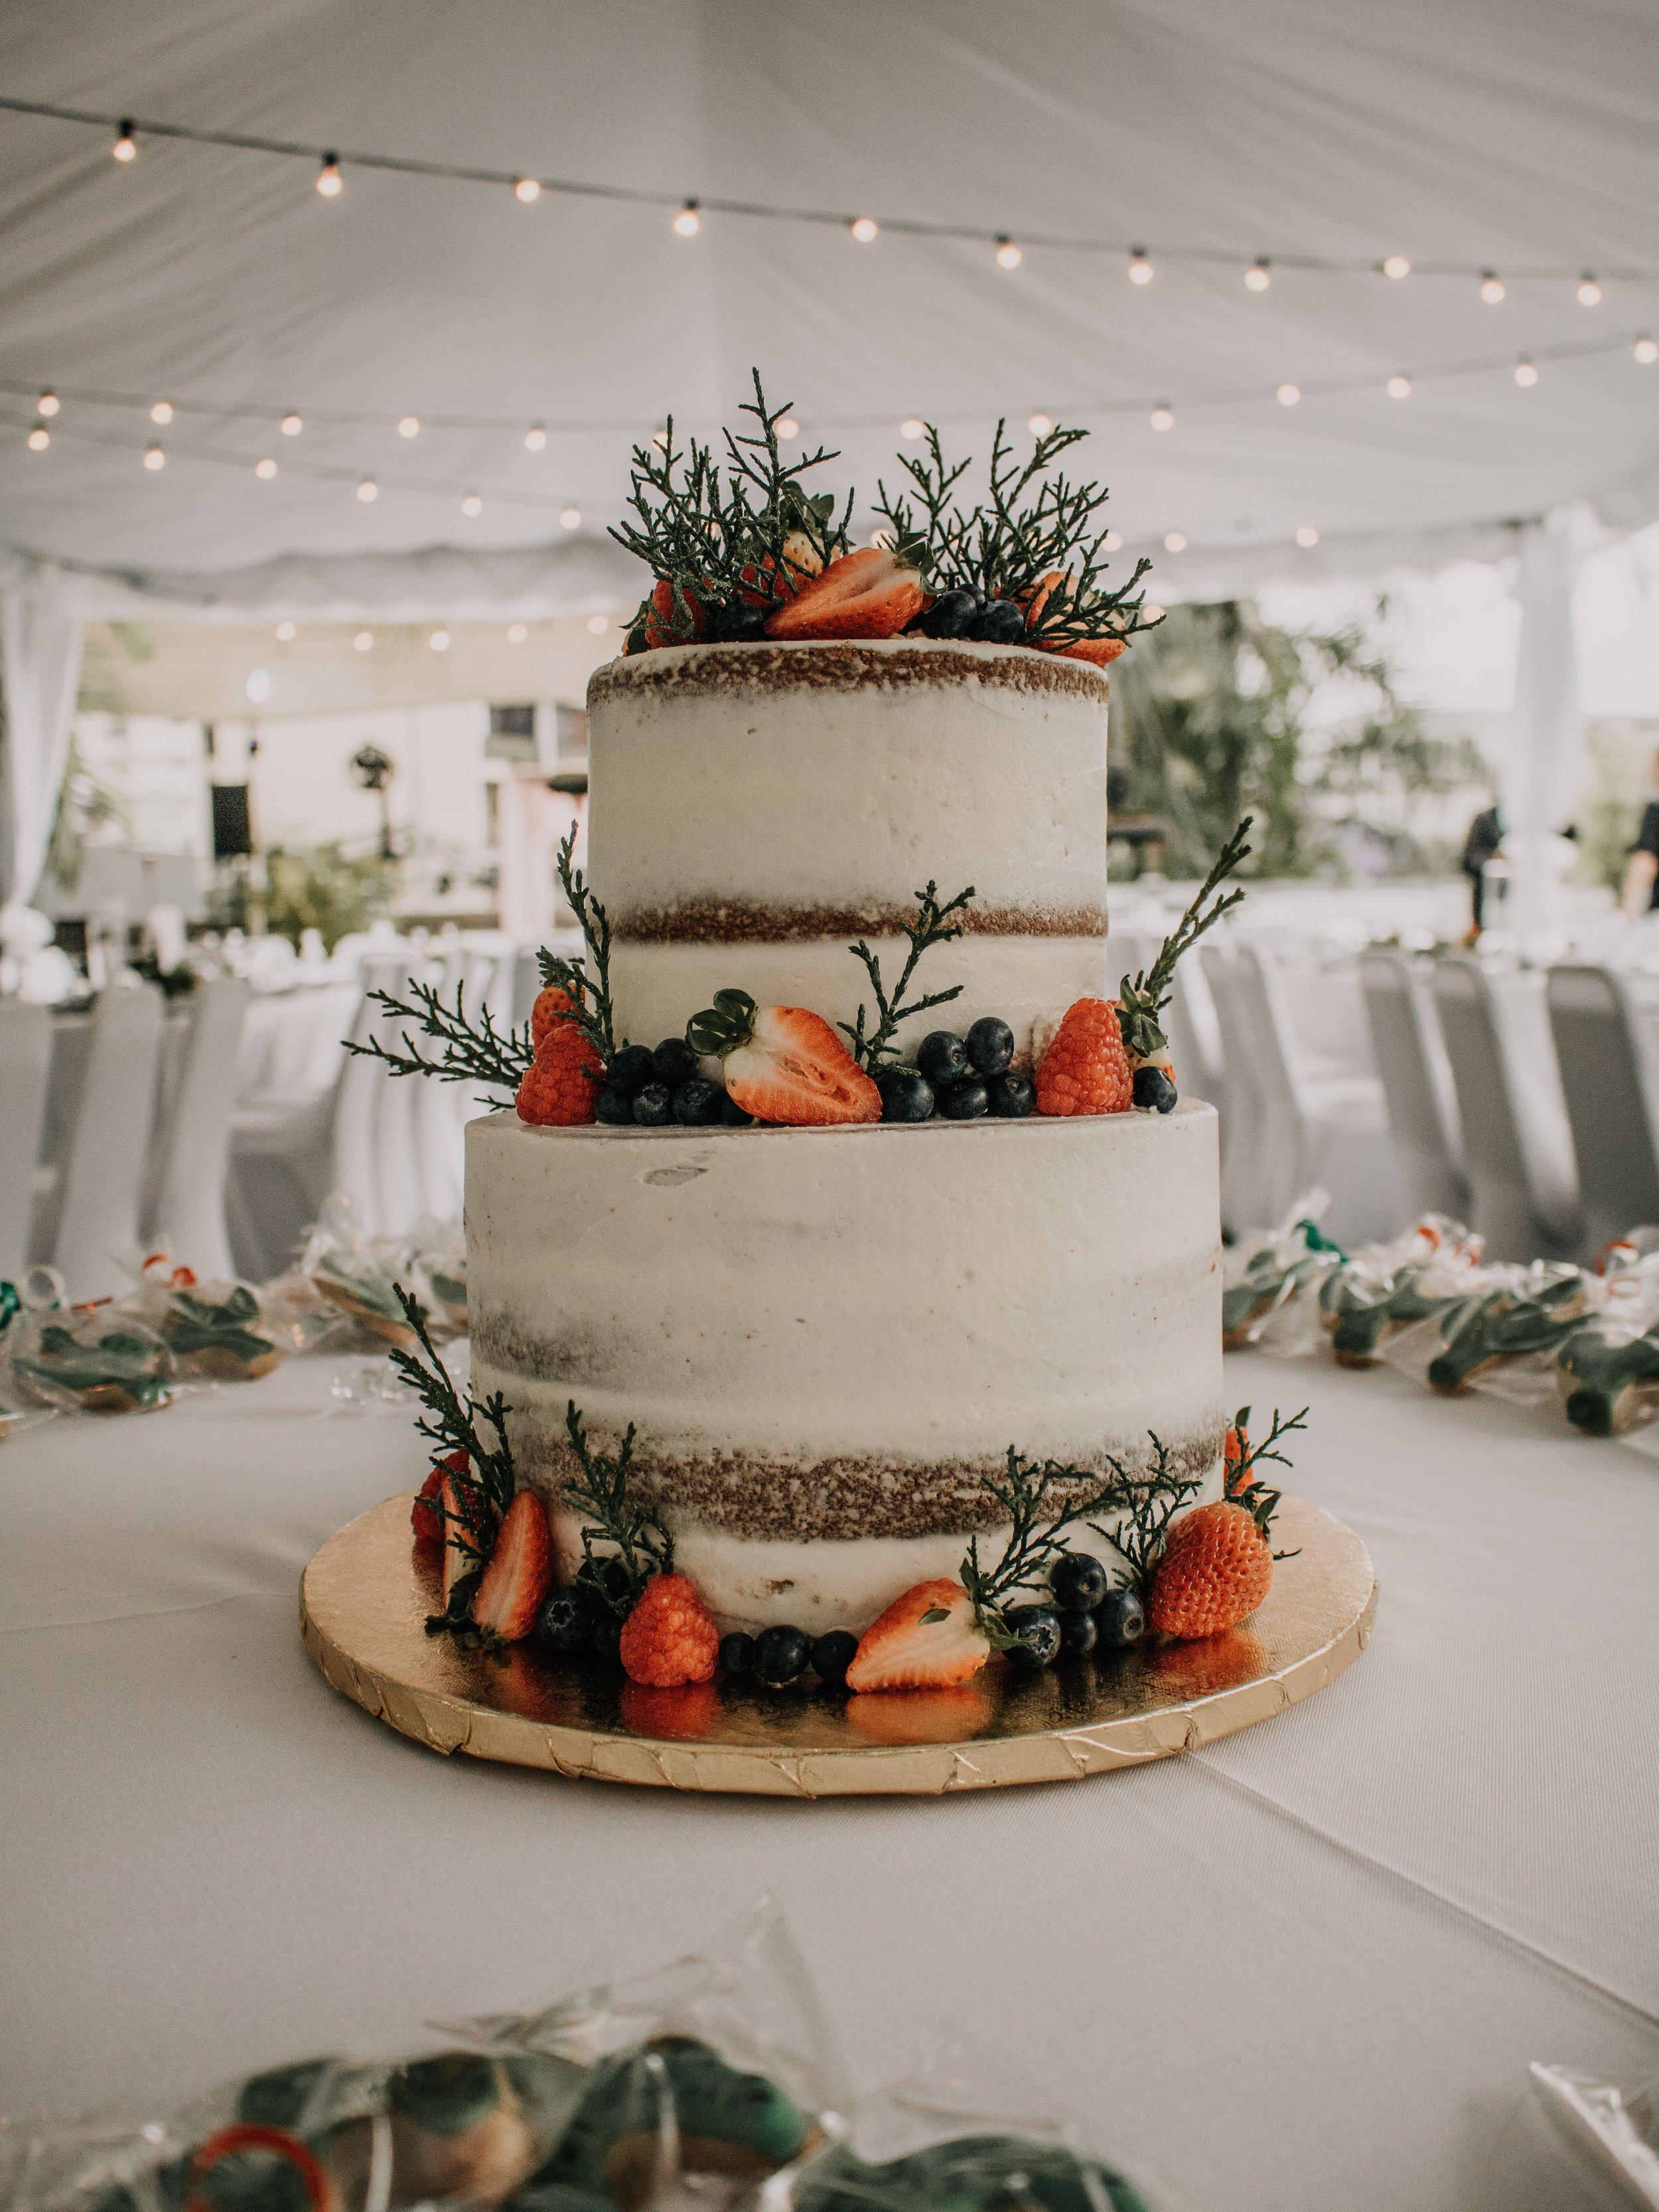 cake-celebration-delicious-1727415.jpg